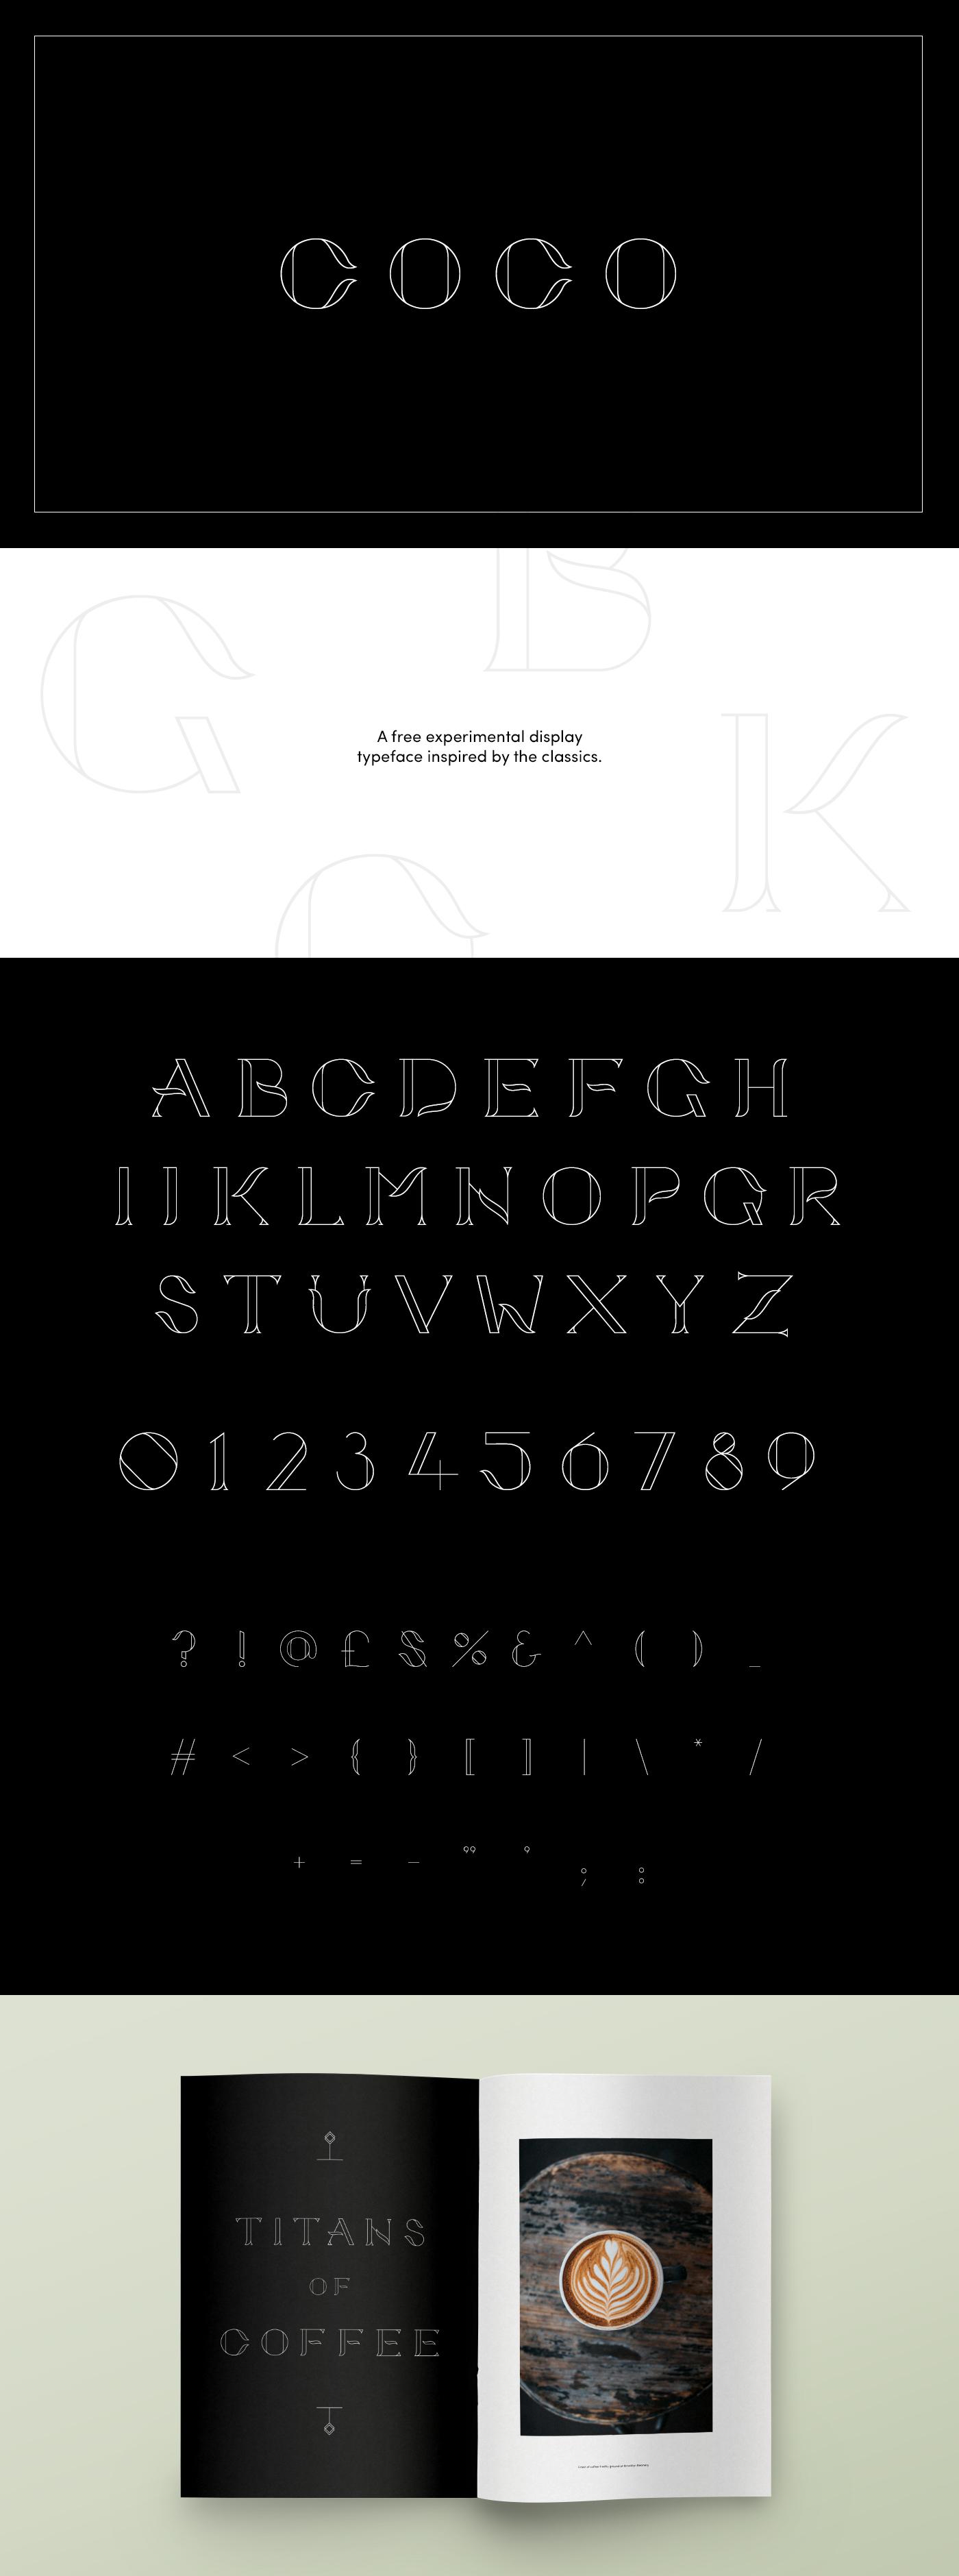 coco-font-01